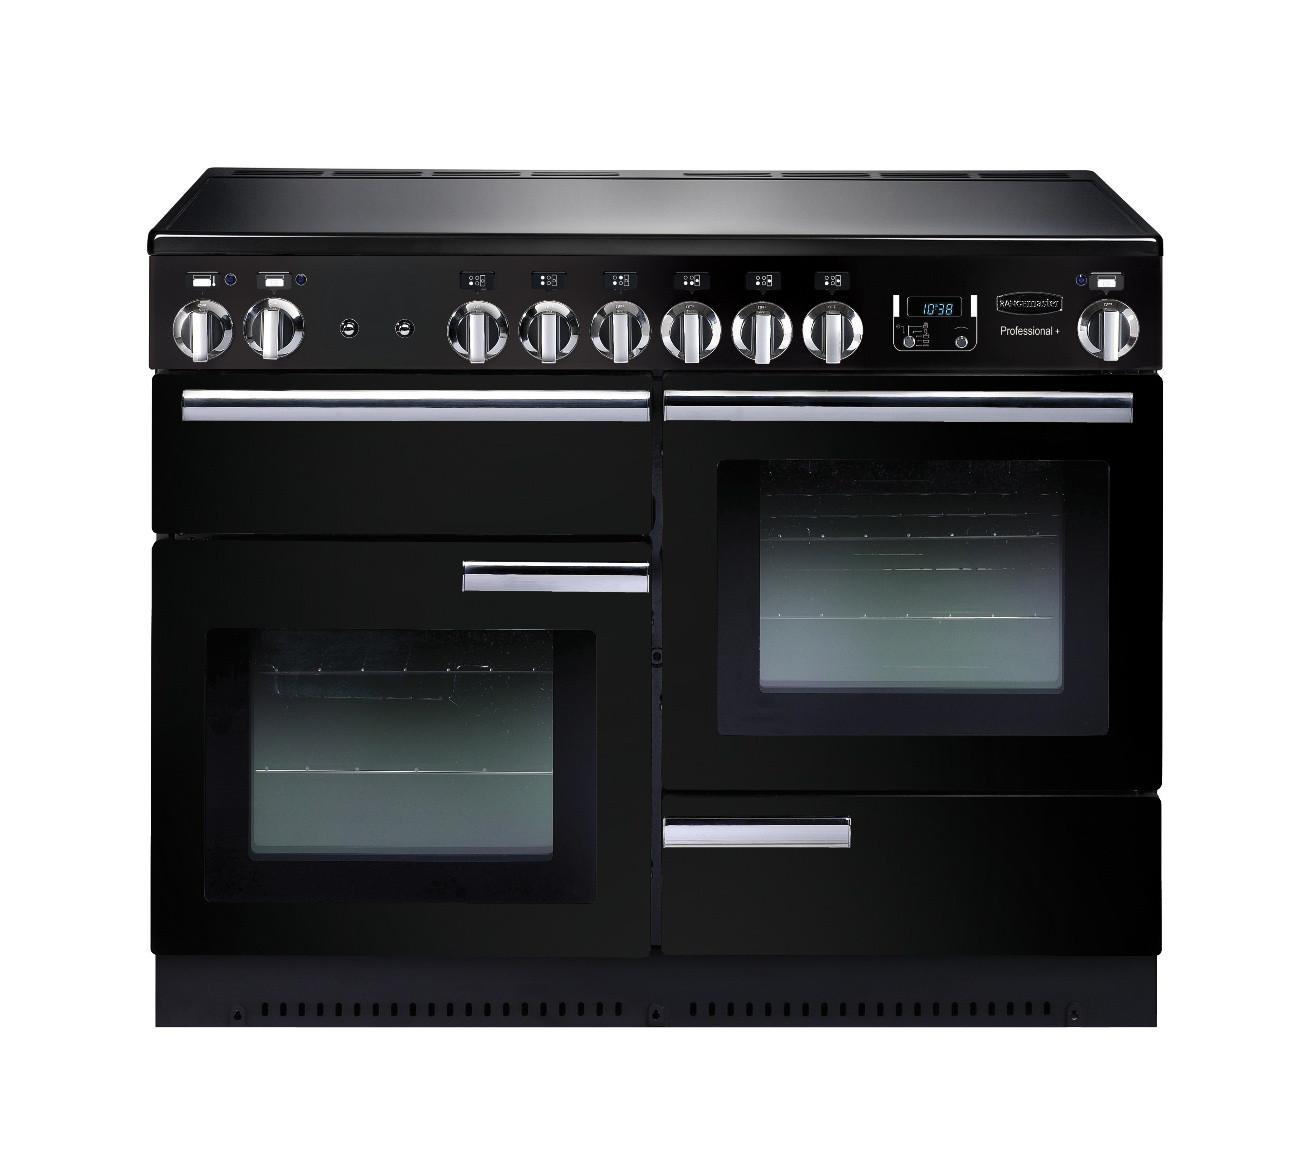 Rangemaster Professional Plus 110 Ceramic Black Range Cooker 91880